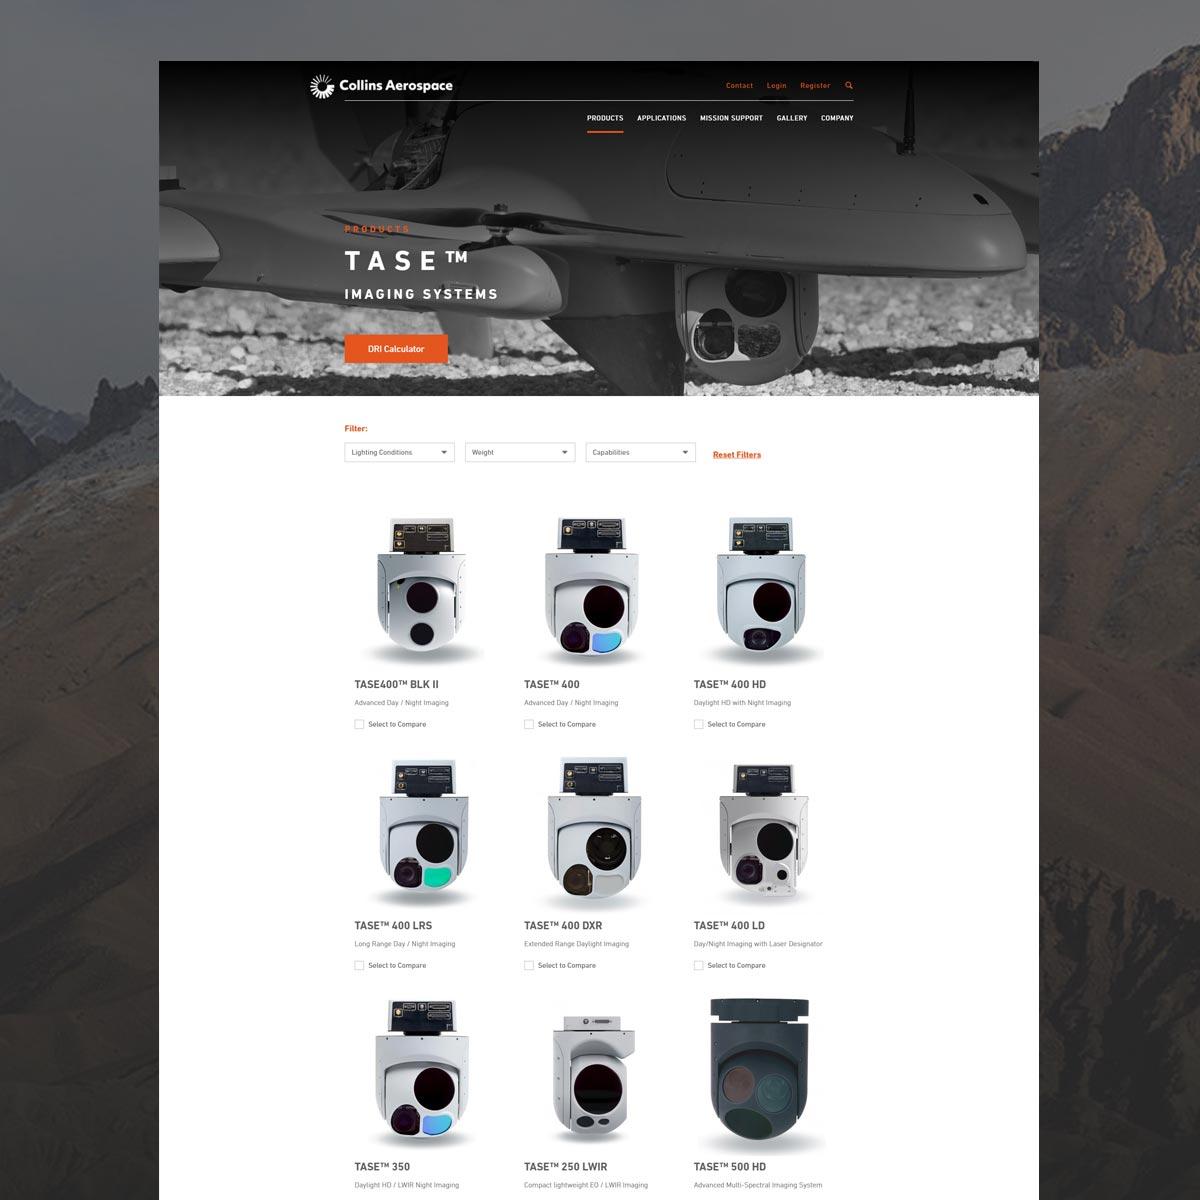 collins aerospace website tase 2